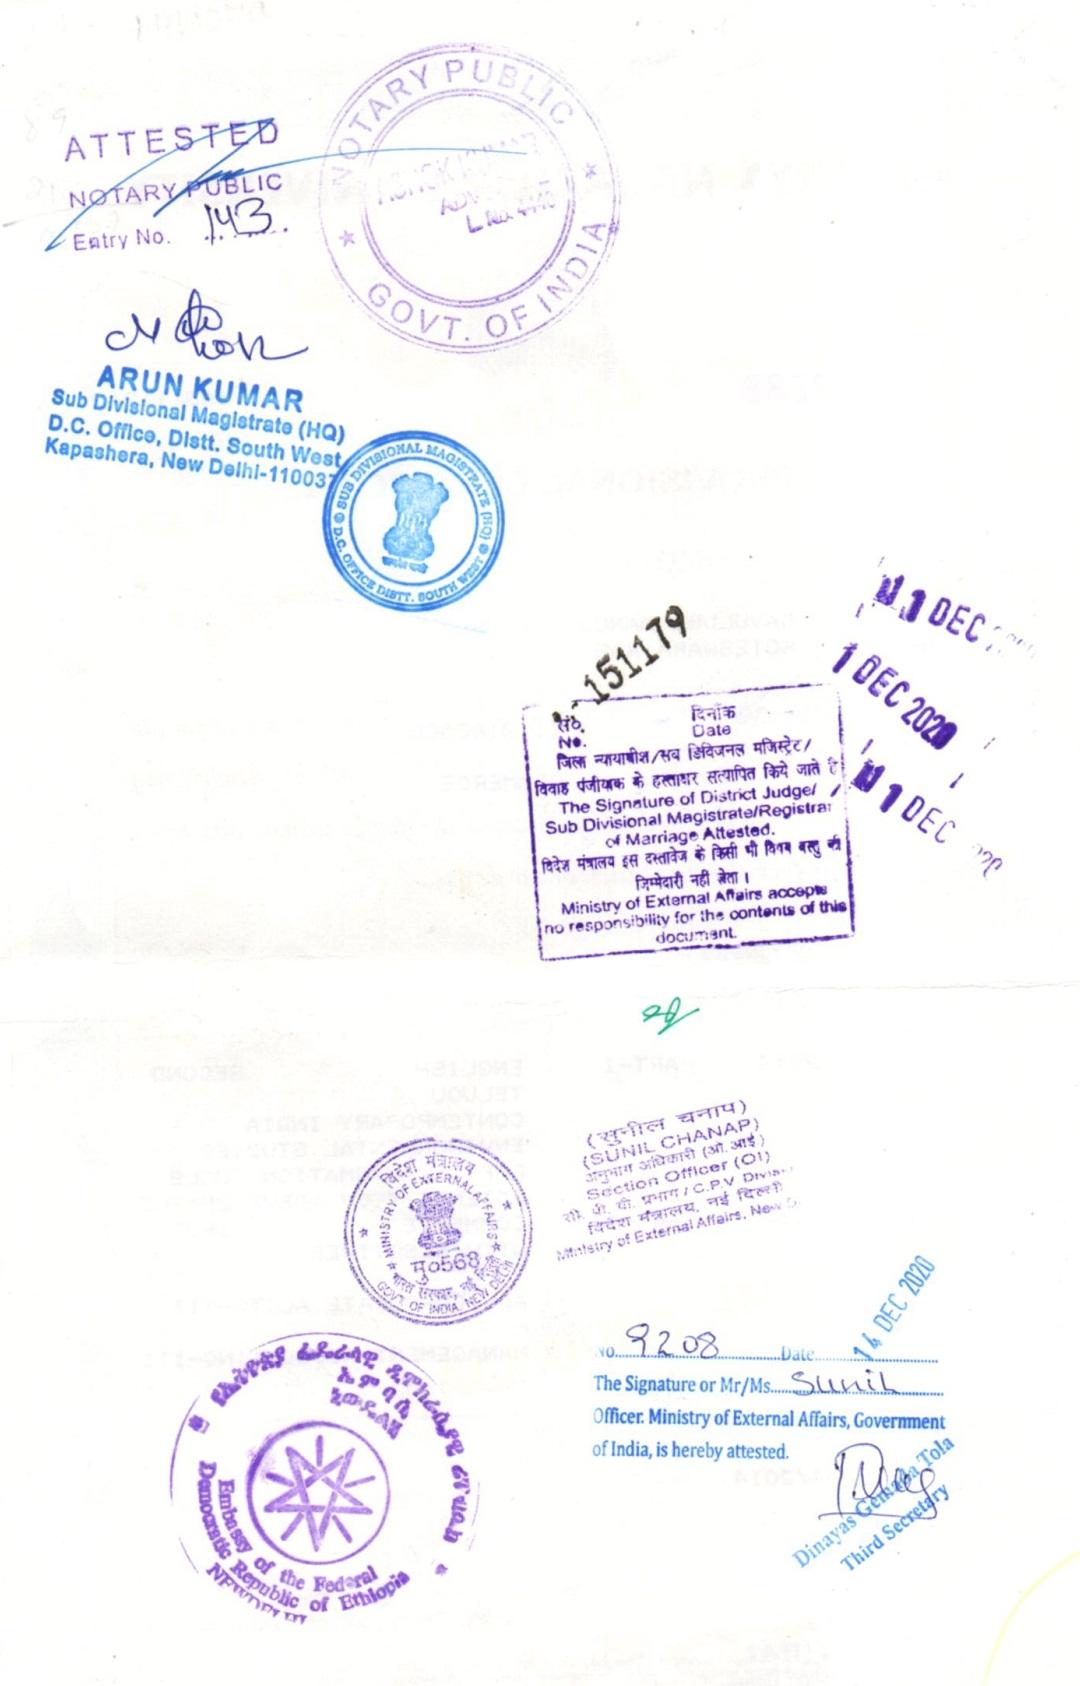 Ethopian Embassy Attestation